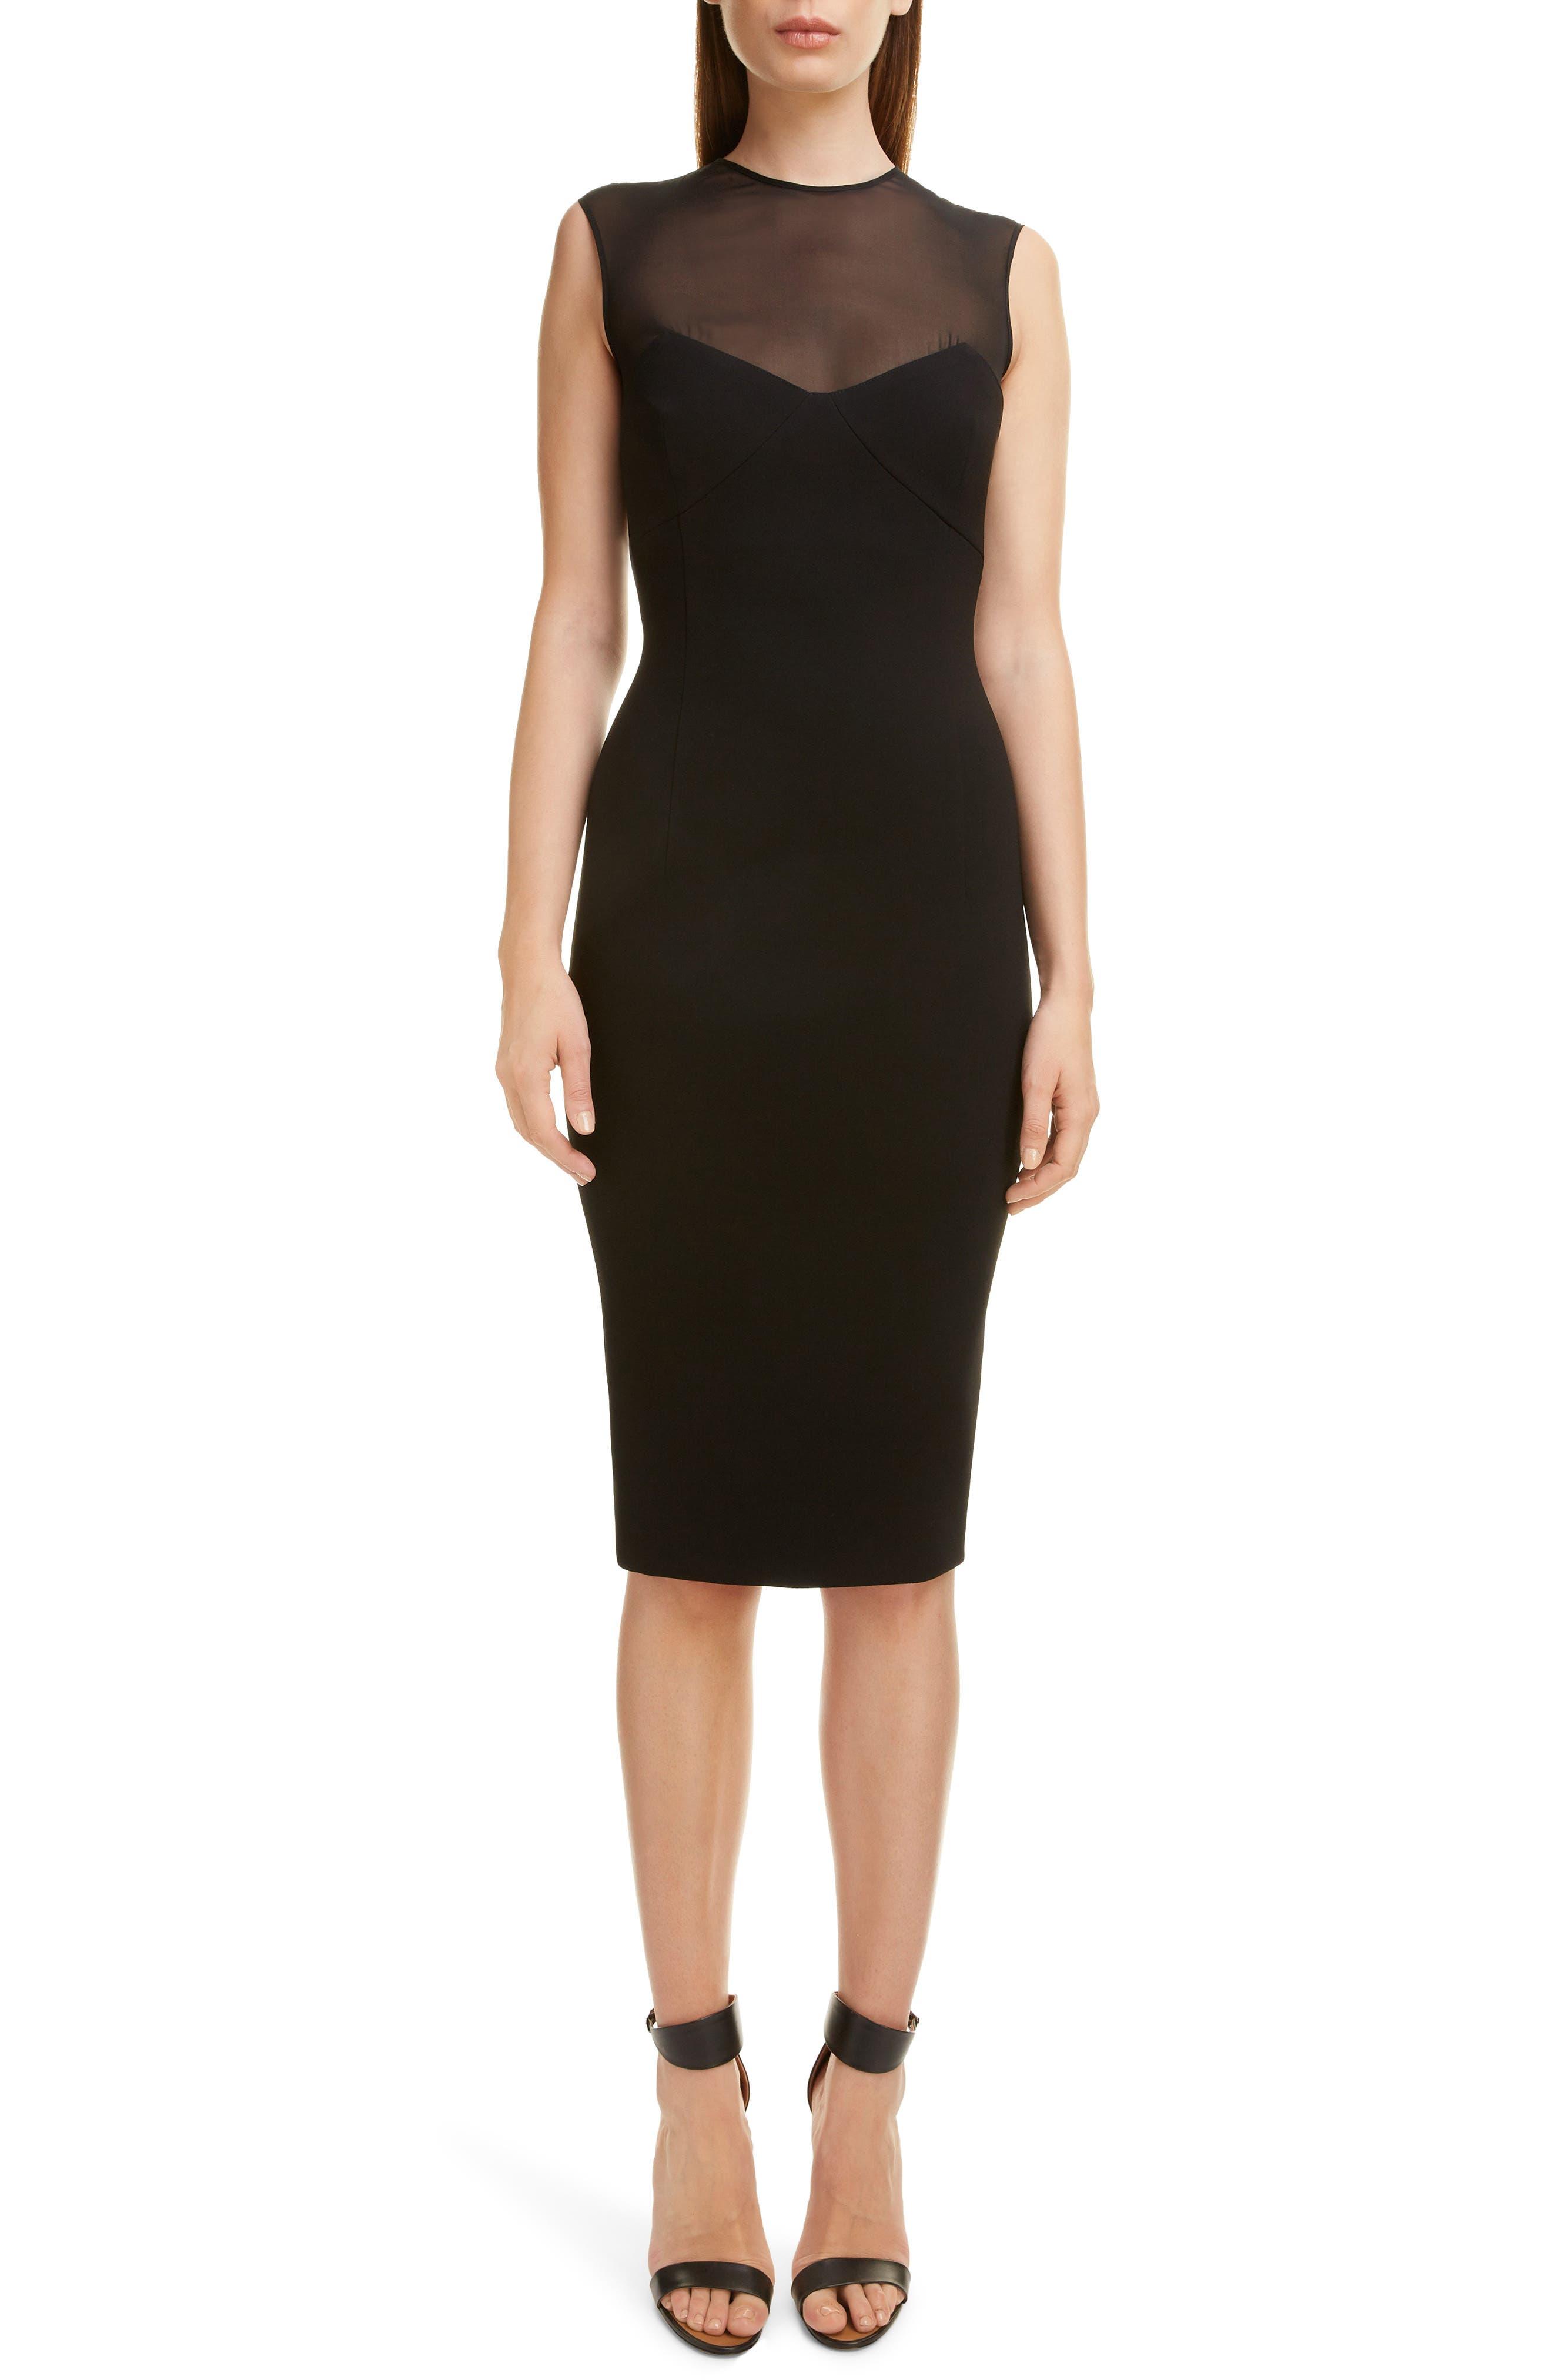 VICTORIA BECKHAM Sheer Yoke Sheath Dress, Main, color, BLACK